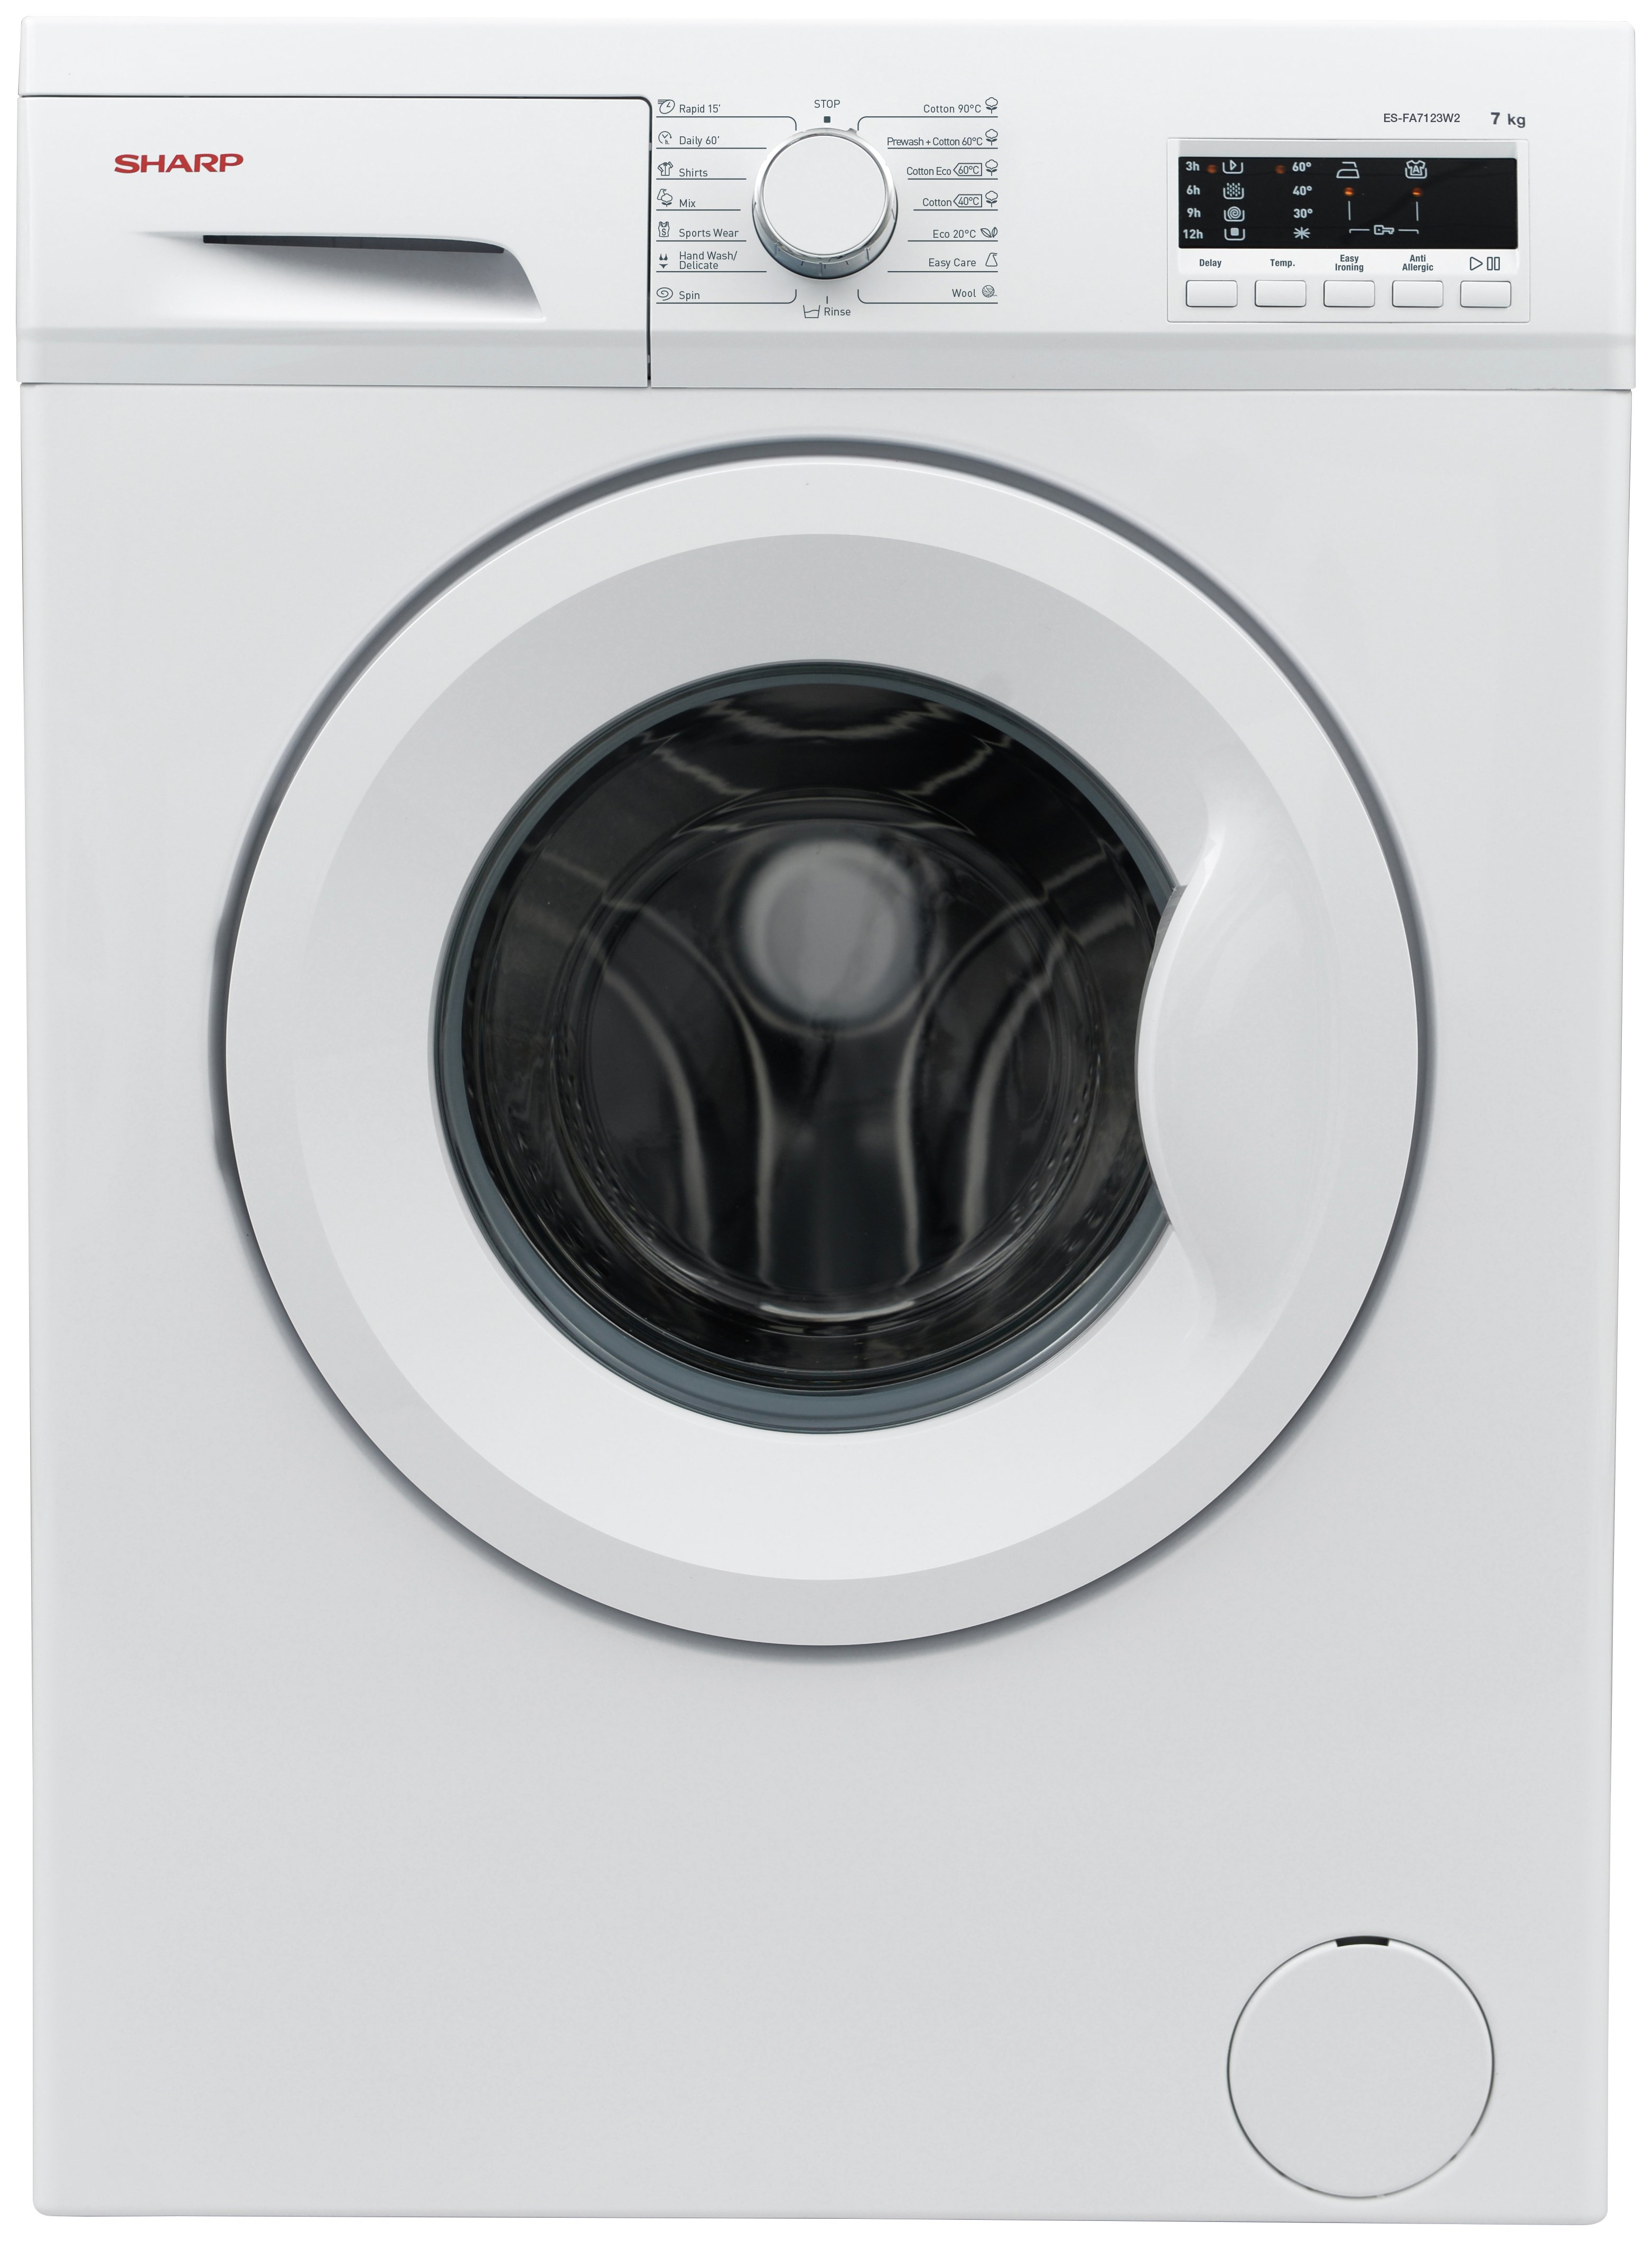 Image of Sharp - FA7123W2 7KG - Washing Machine